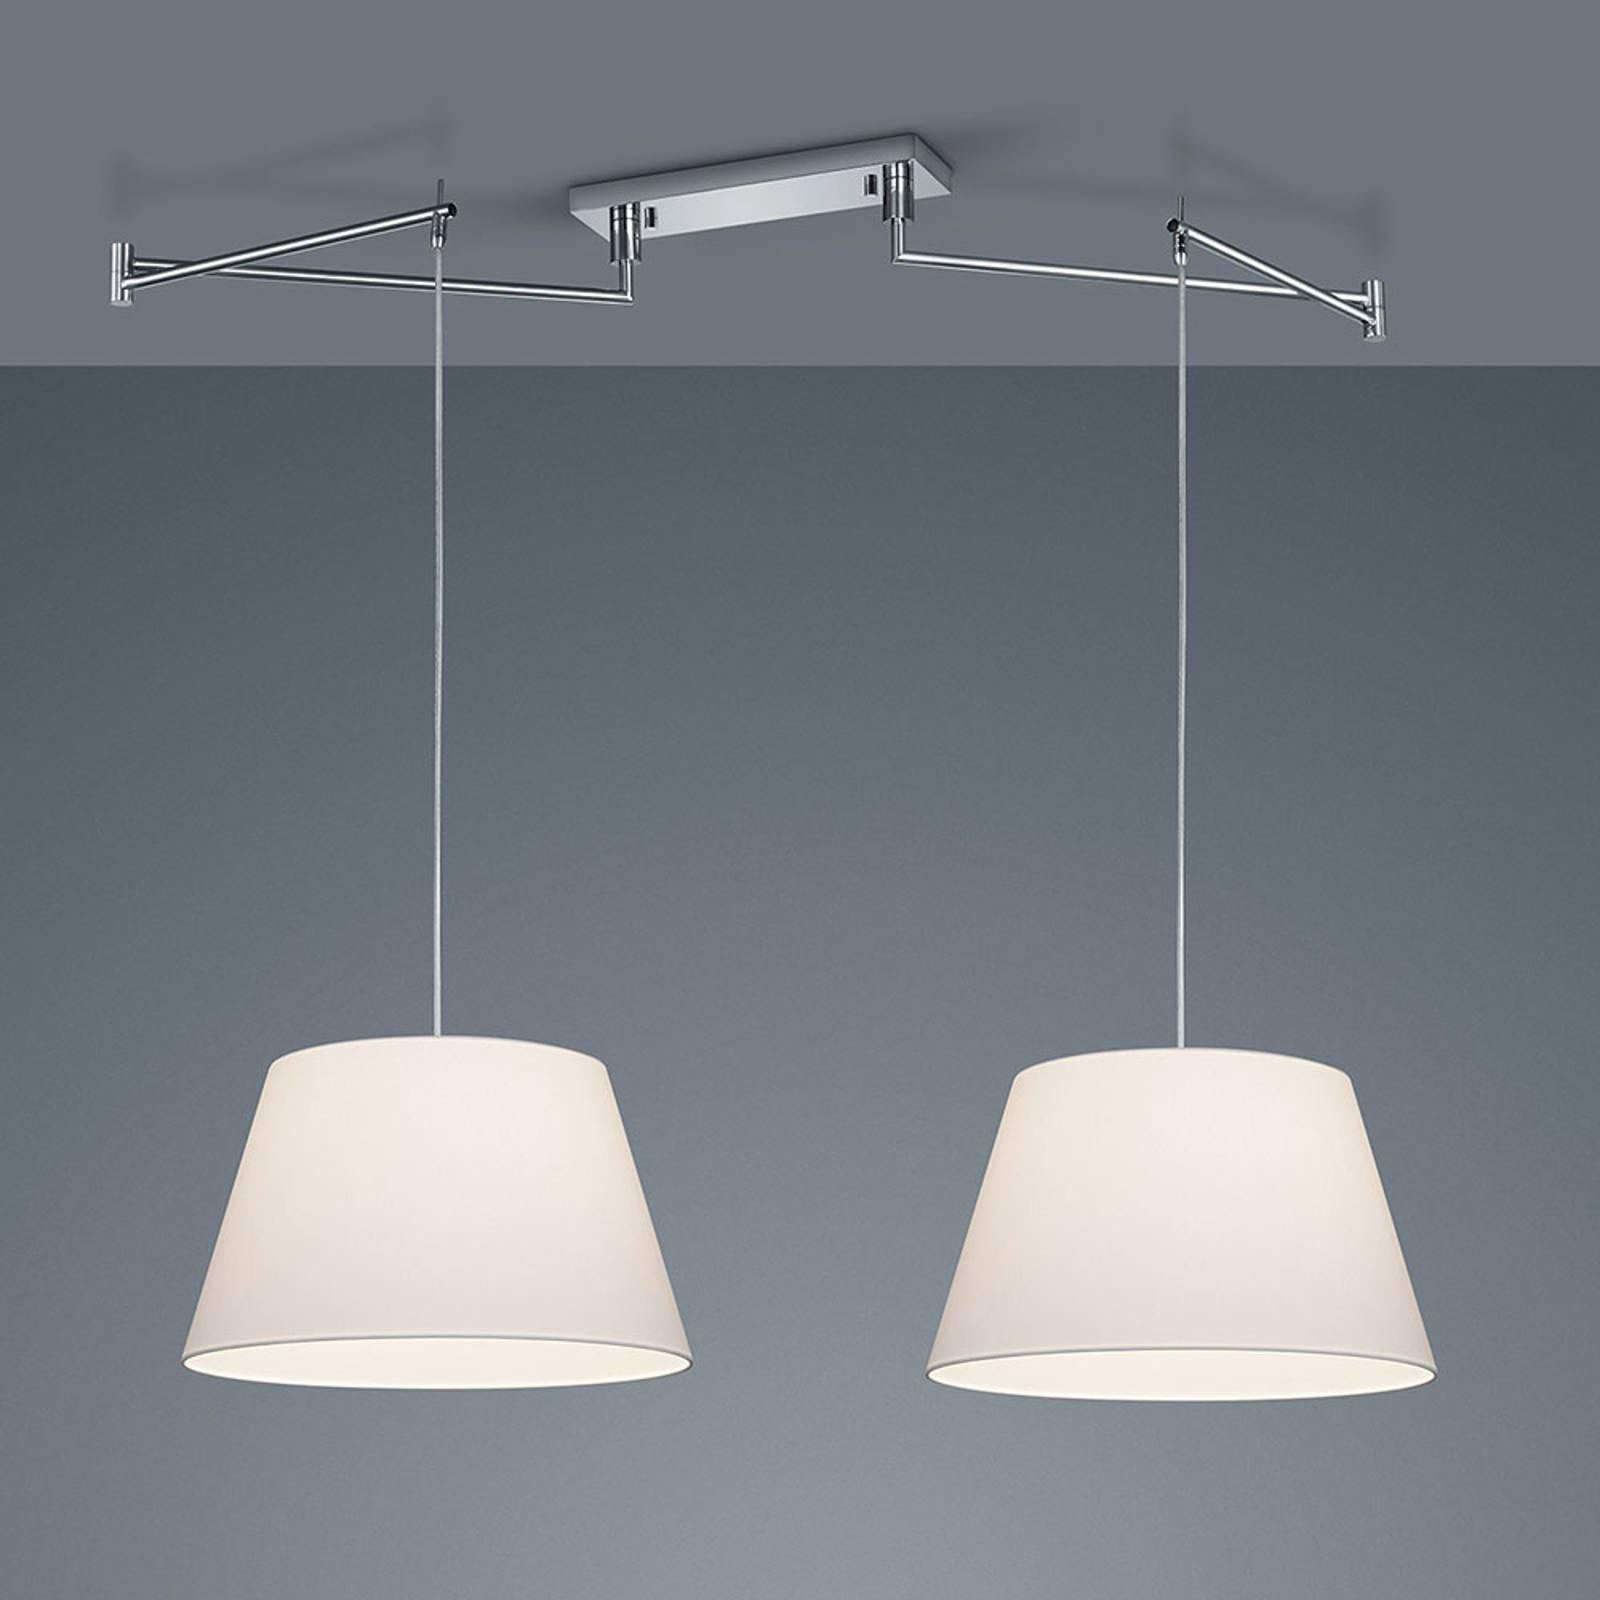 Helestra Certo suspension conique 2 lampes blanche